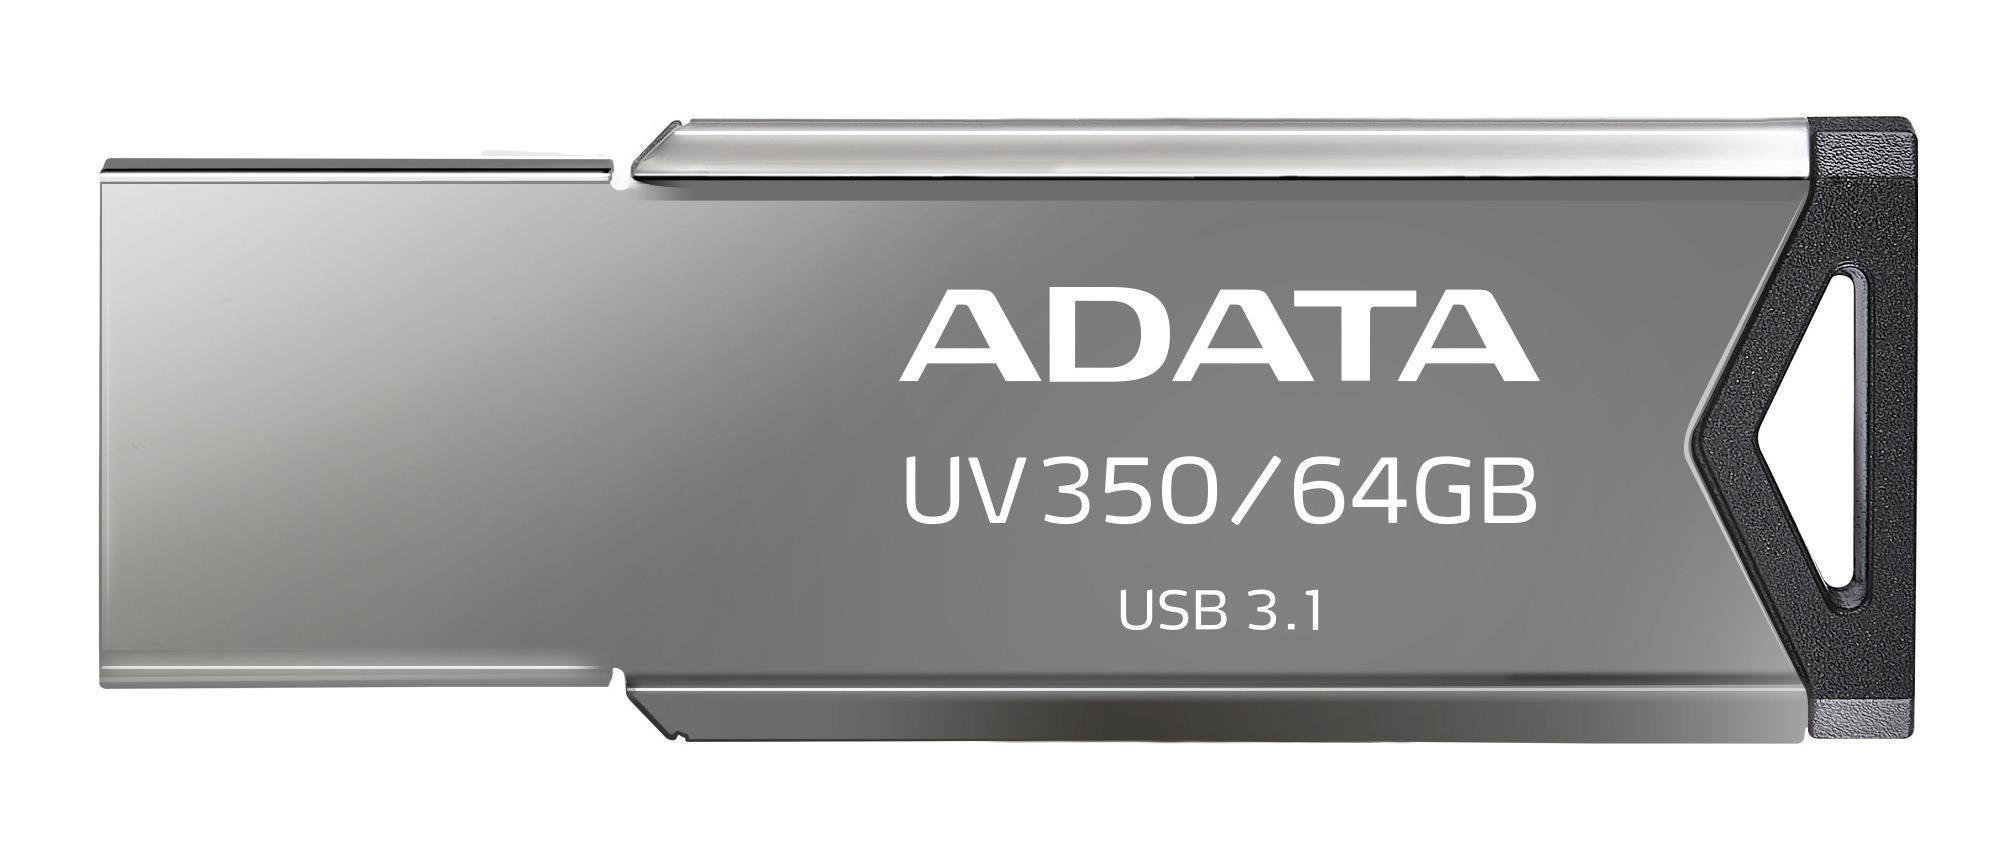 ADATA представляет USB флэш-накопитель UV350